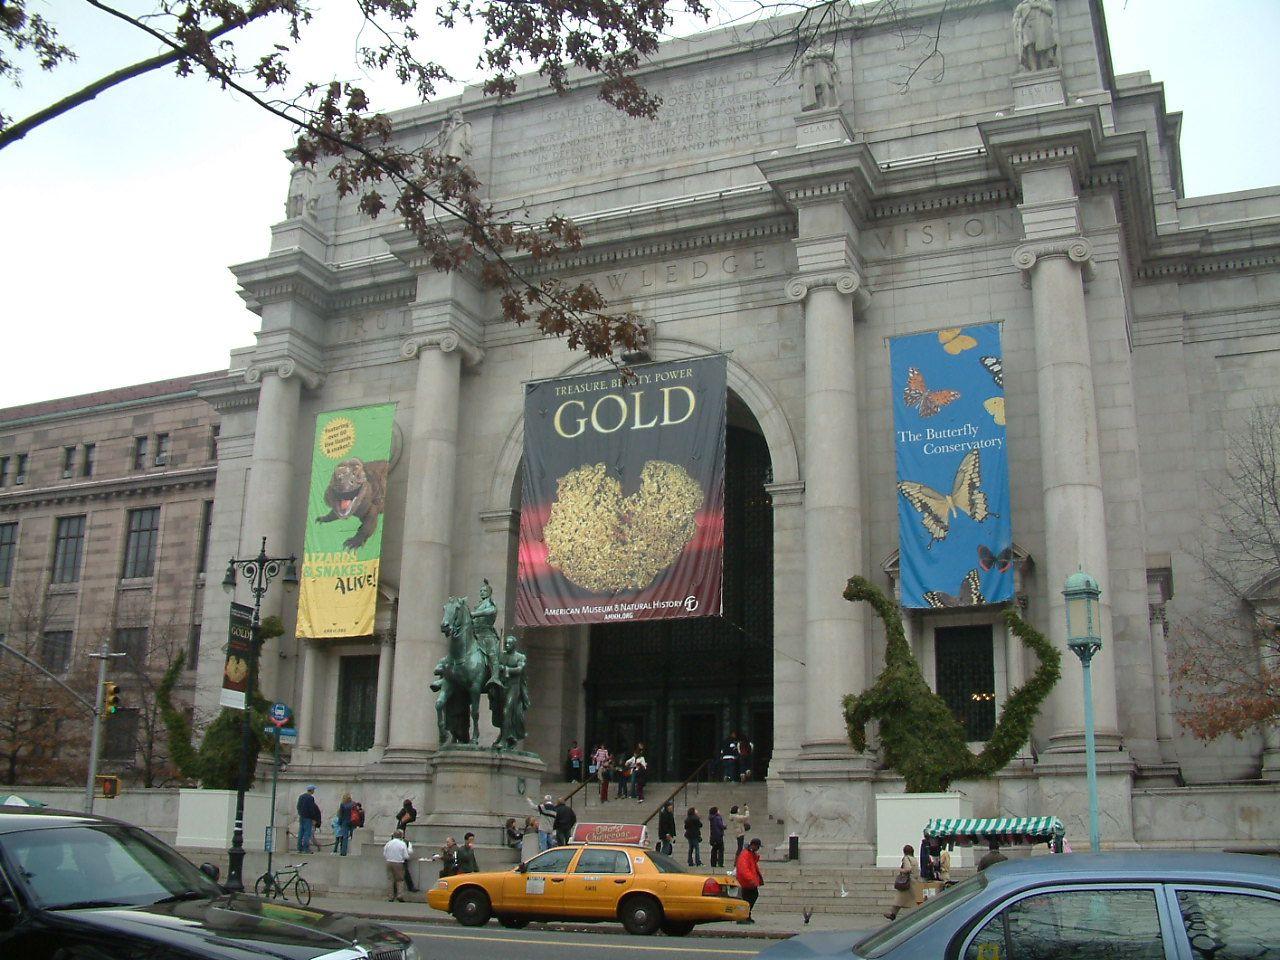 175897fbff0075cfed9335d07f3d8560 - How Do I Get To The Museum Of Natural History